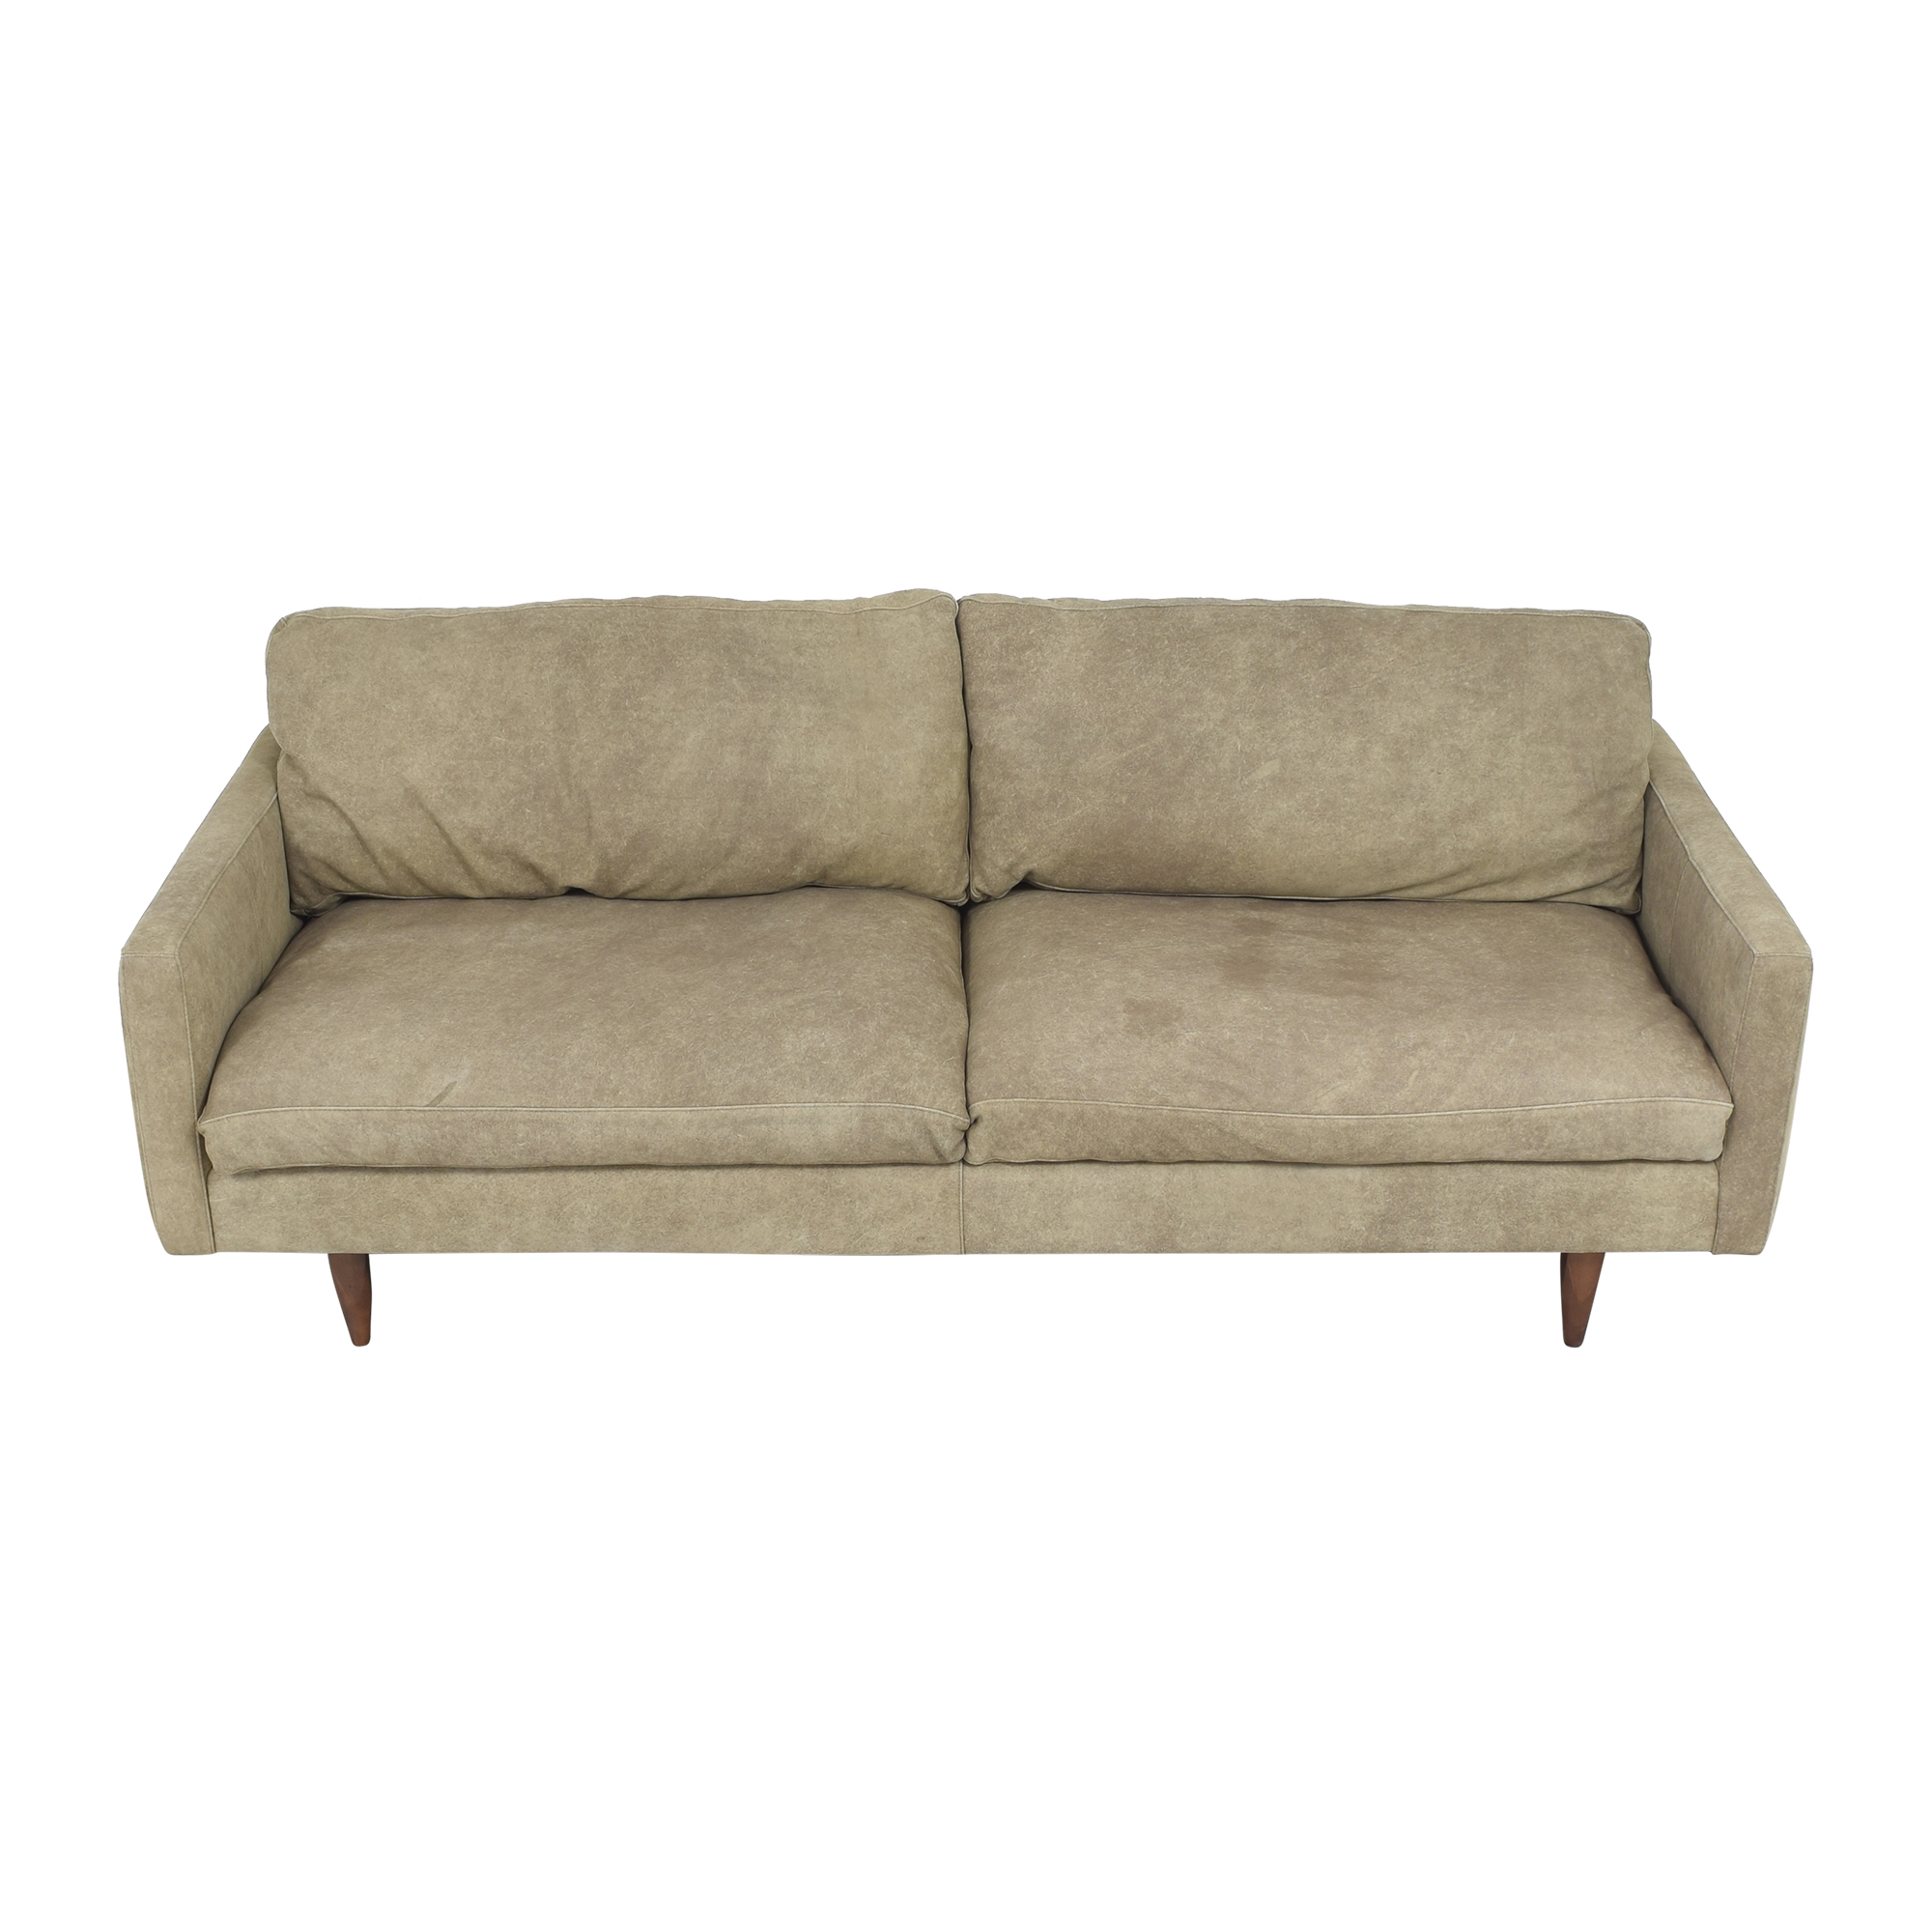 Room & Board Room & Board Jasper Two Cushion Sofa second hand